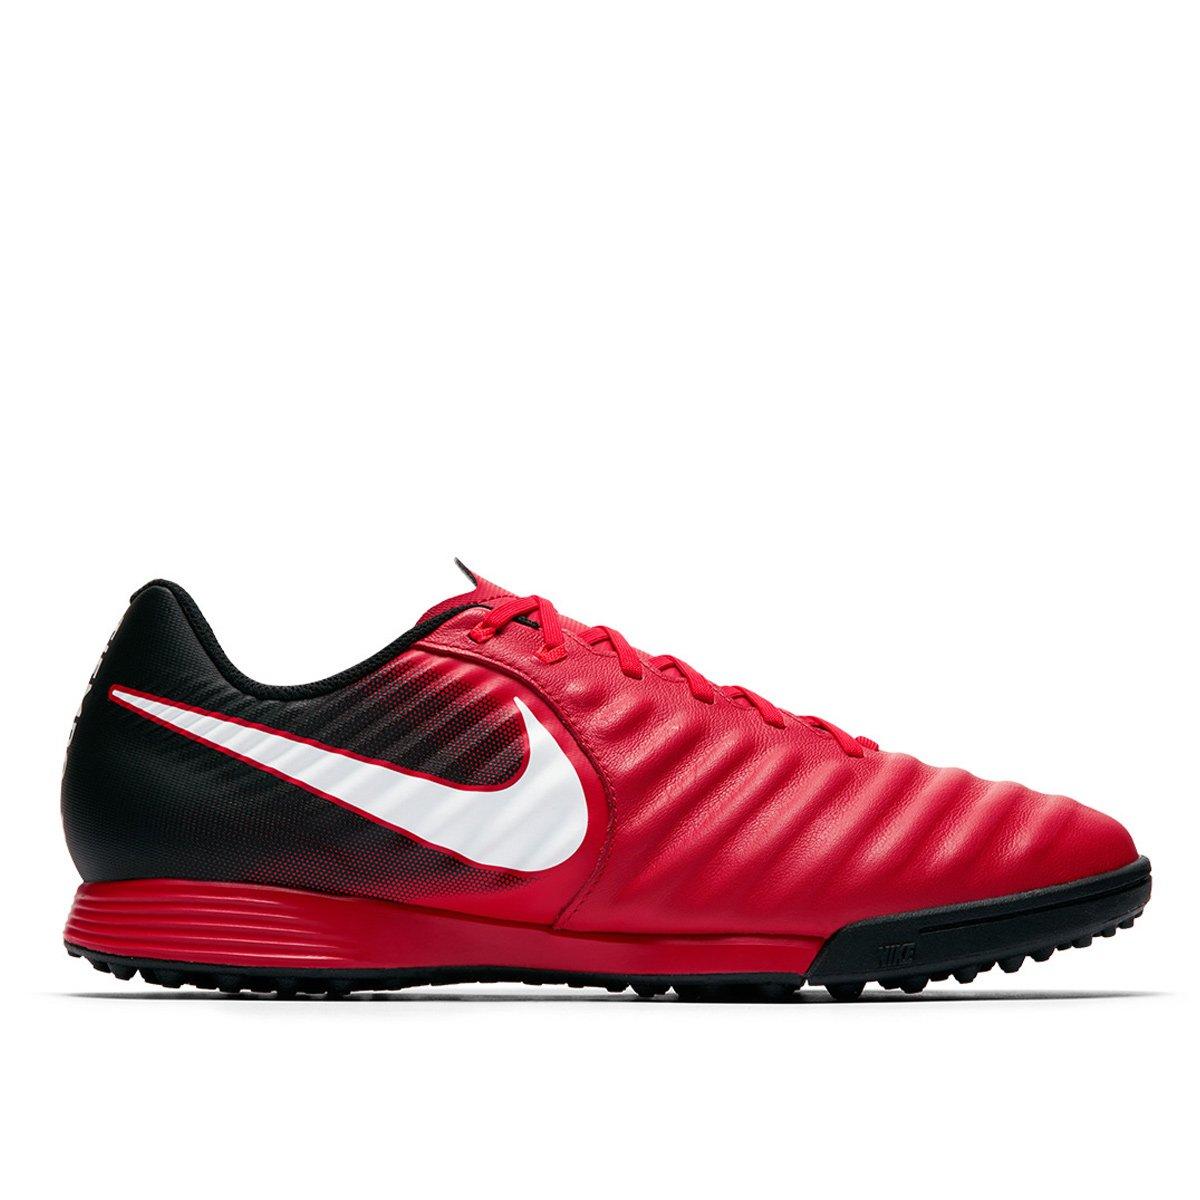 925eca8e1f Chuteira Society Nike Tiempo Ligera 4 TF - Vermelho e Branco